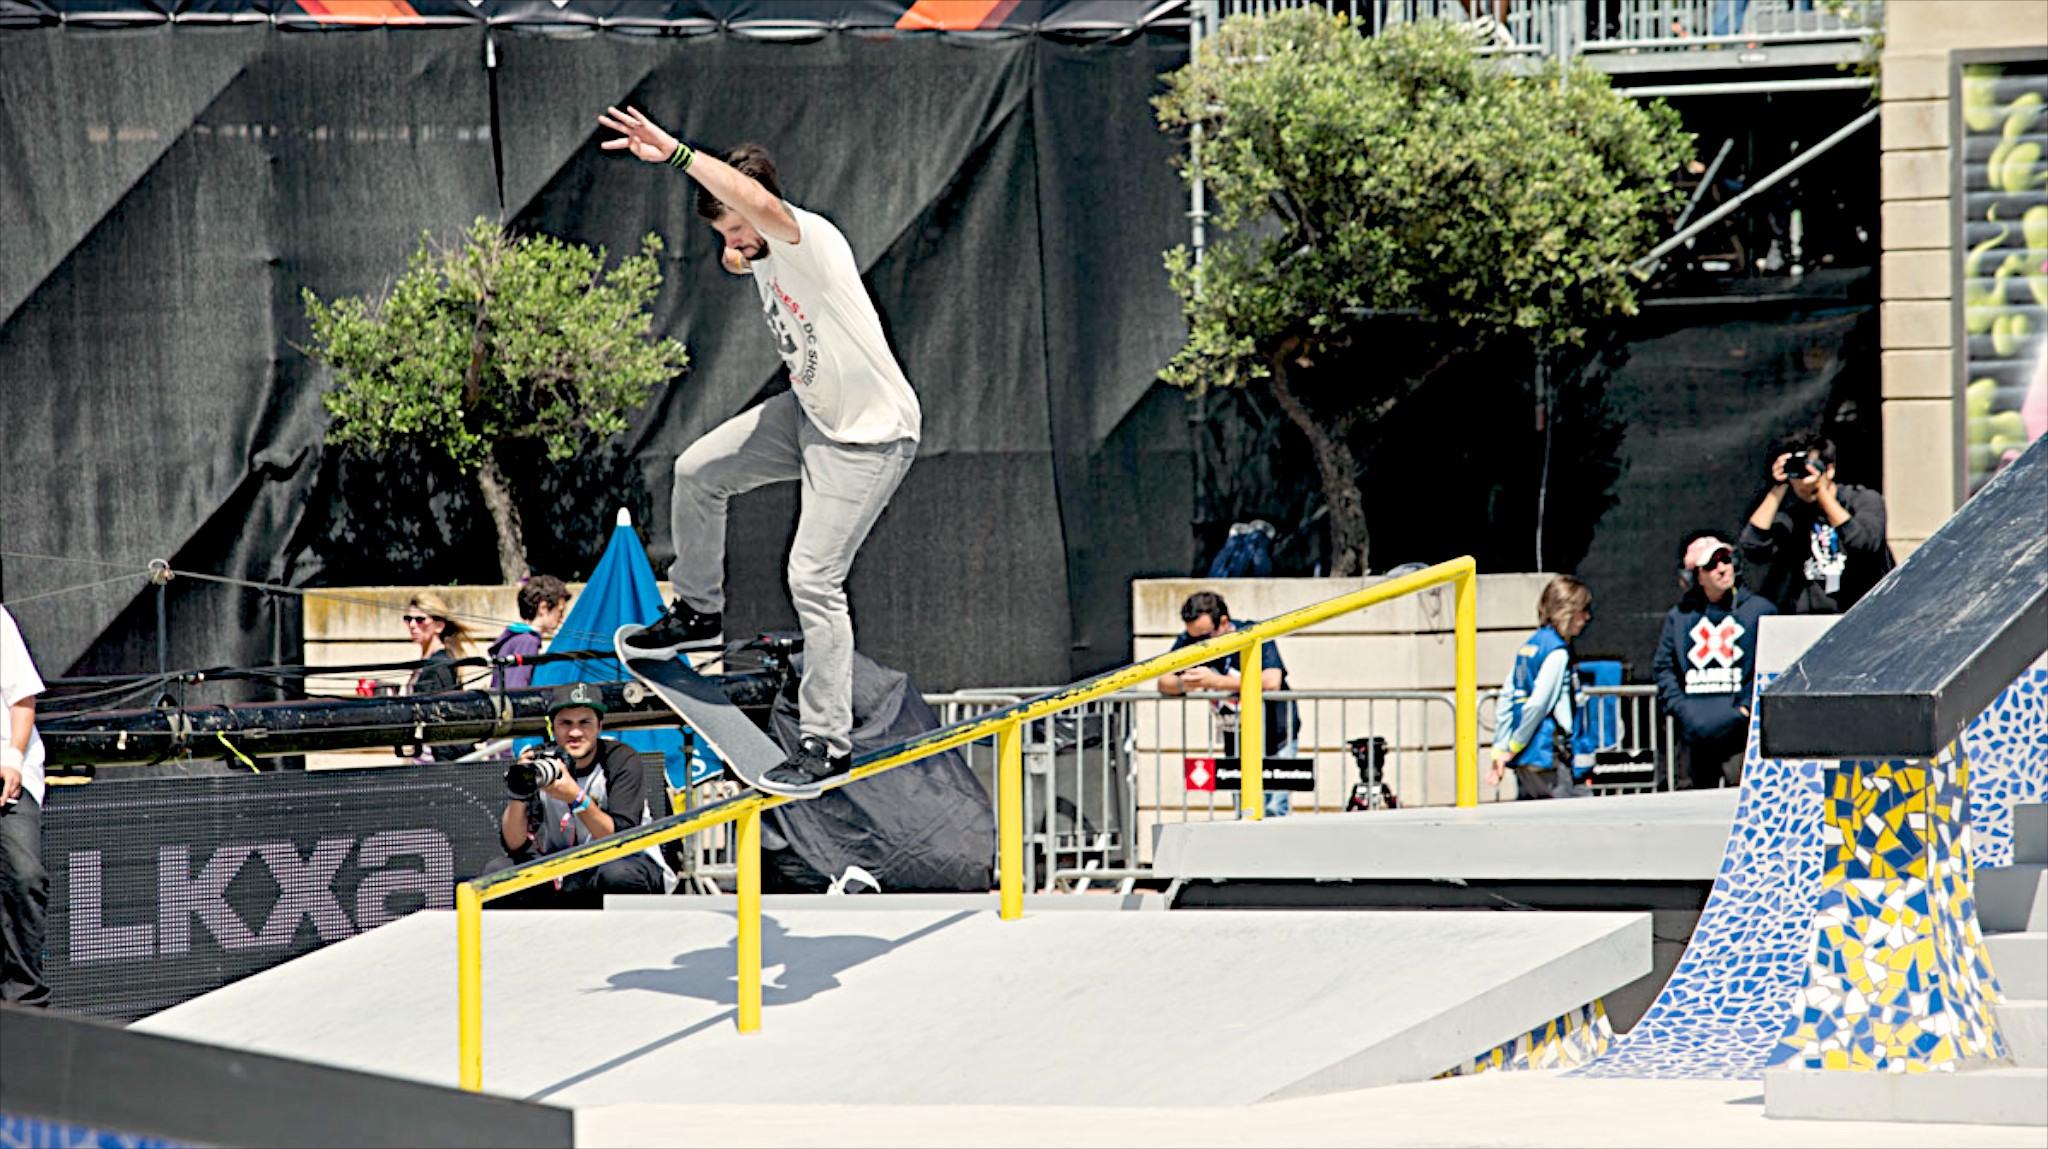 Chris Cole